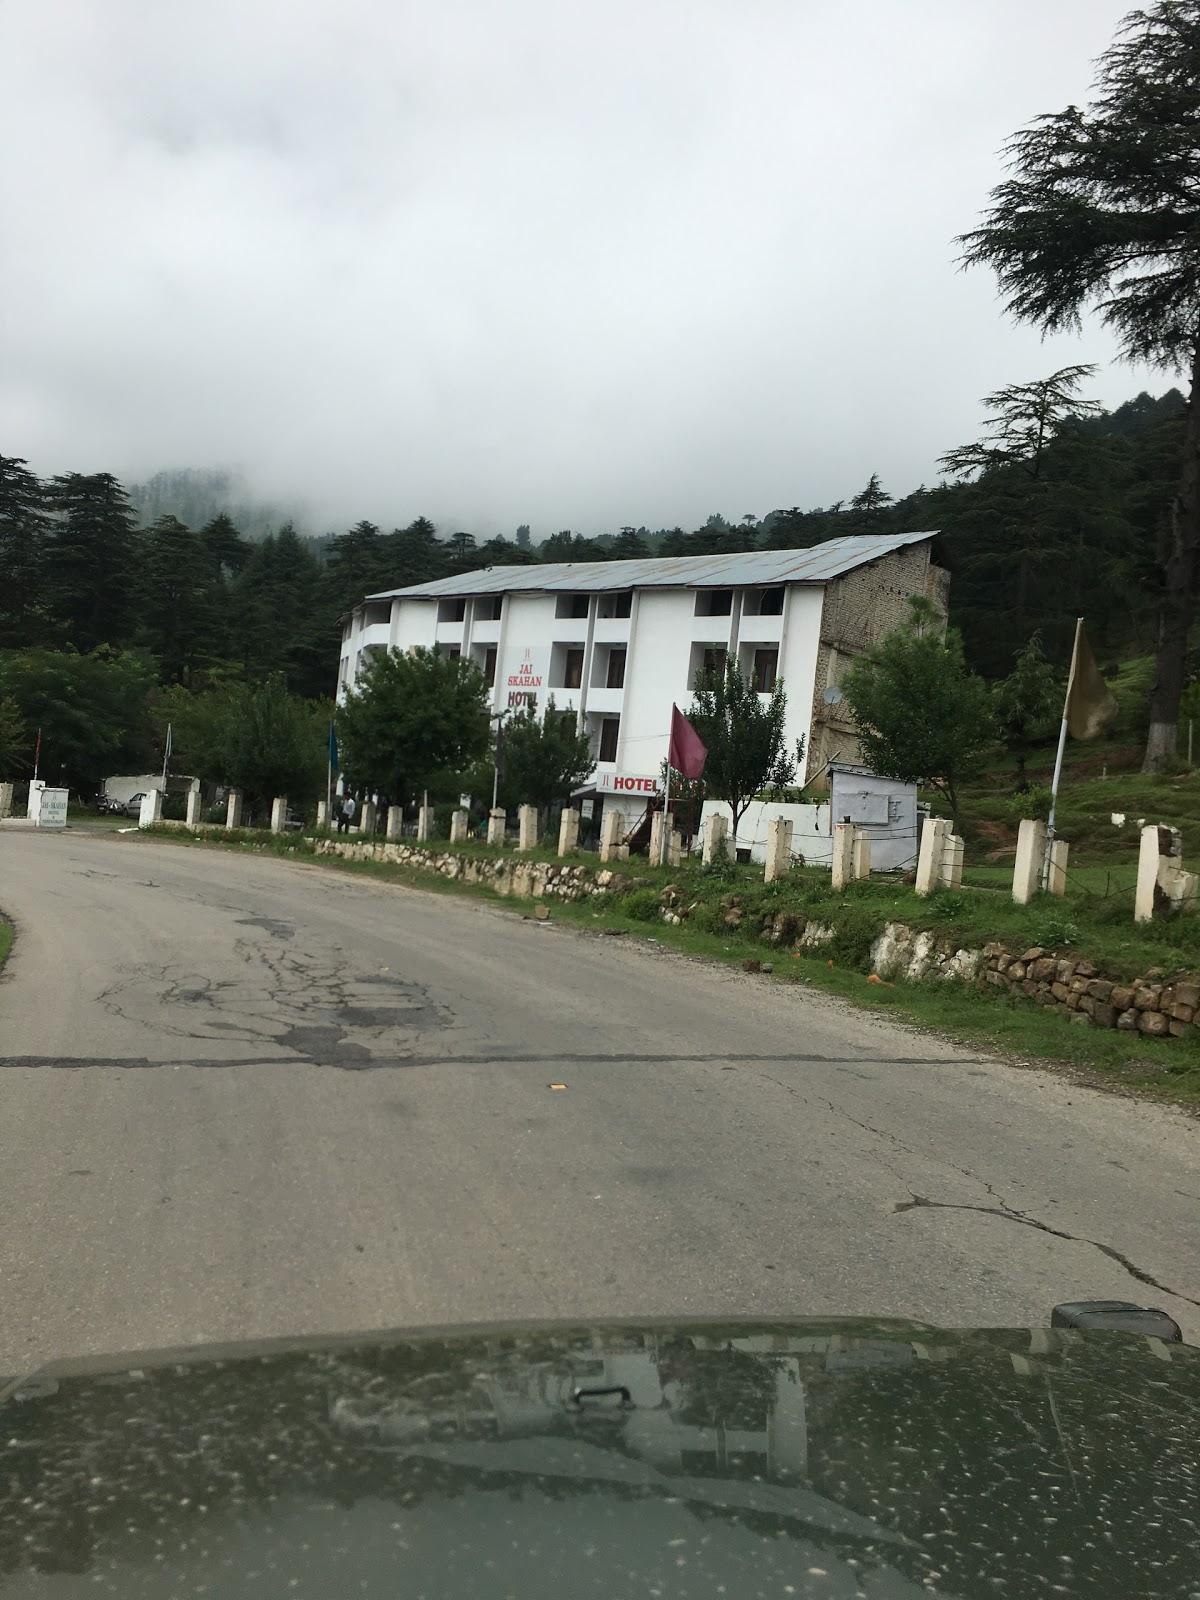 Hotel Jai Skahan Oyo Rooms 004 Padora Enclave Patnitop Around Guides